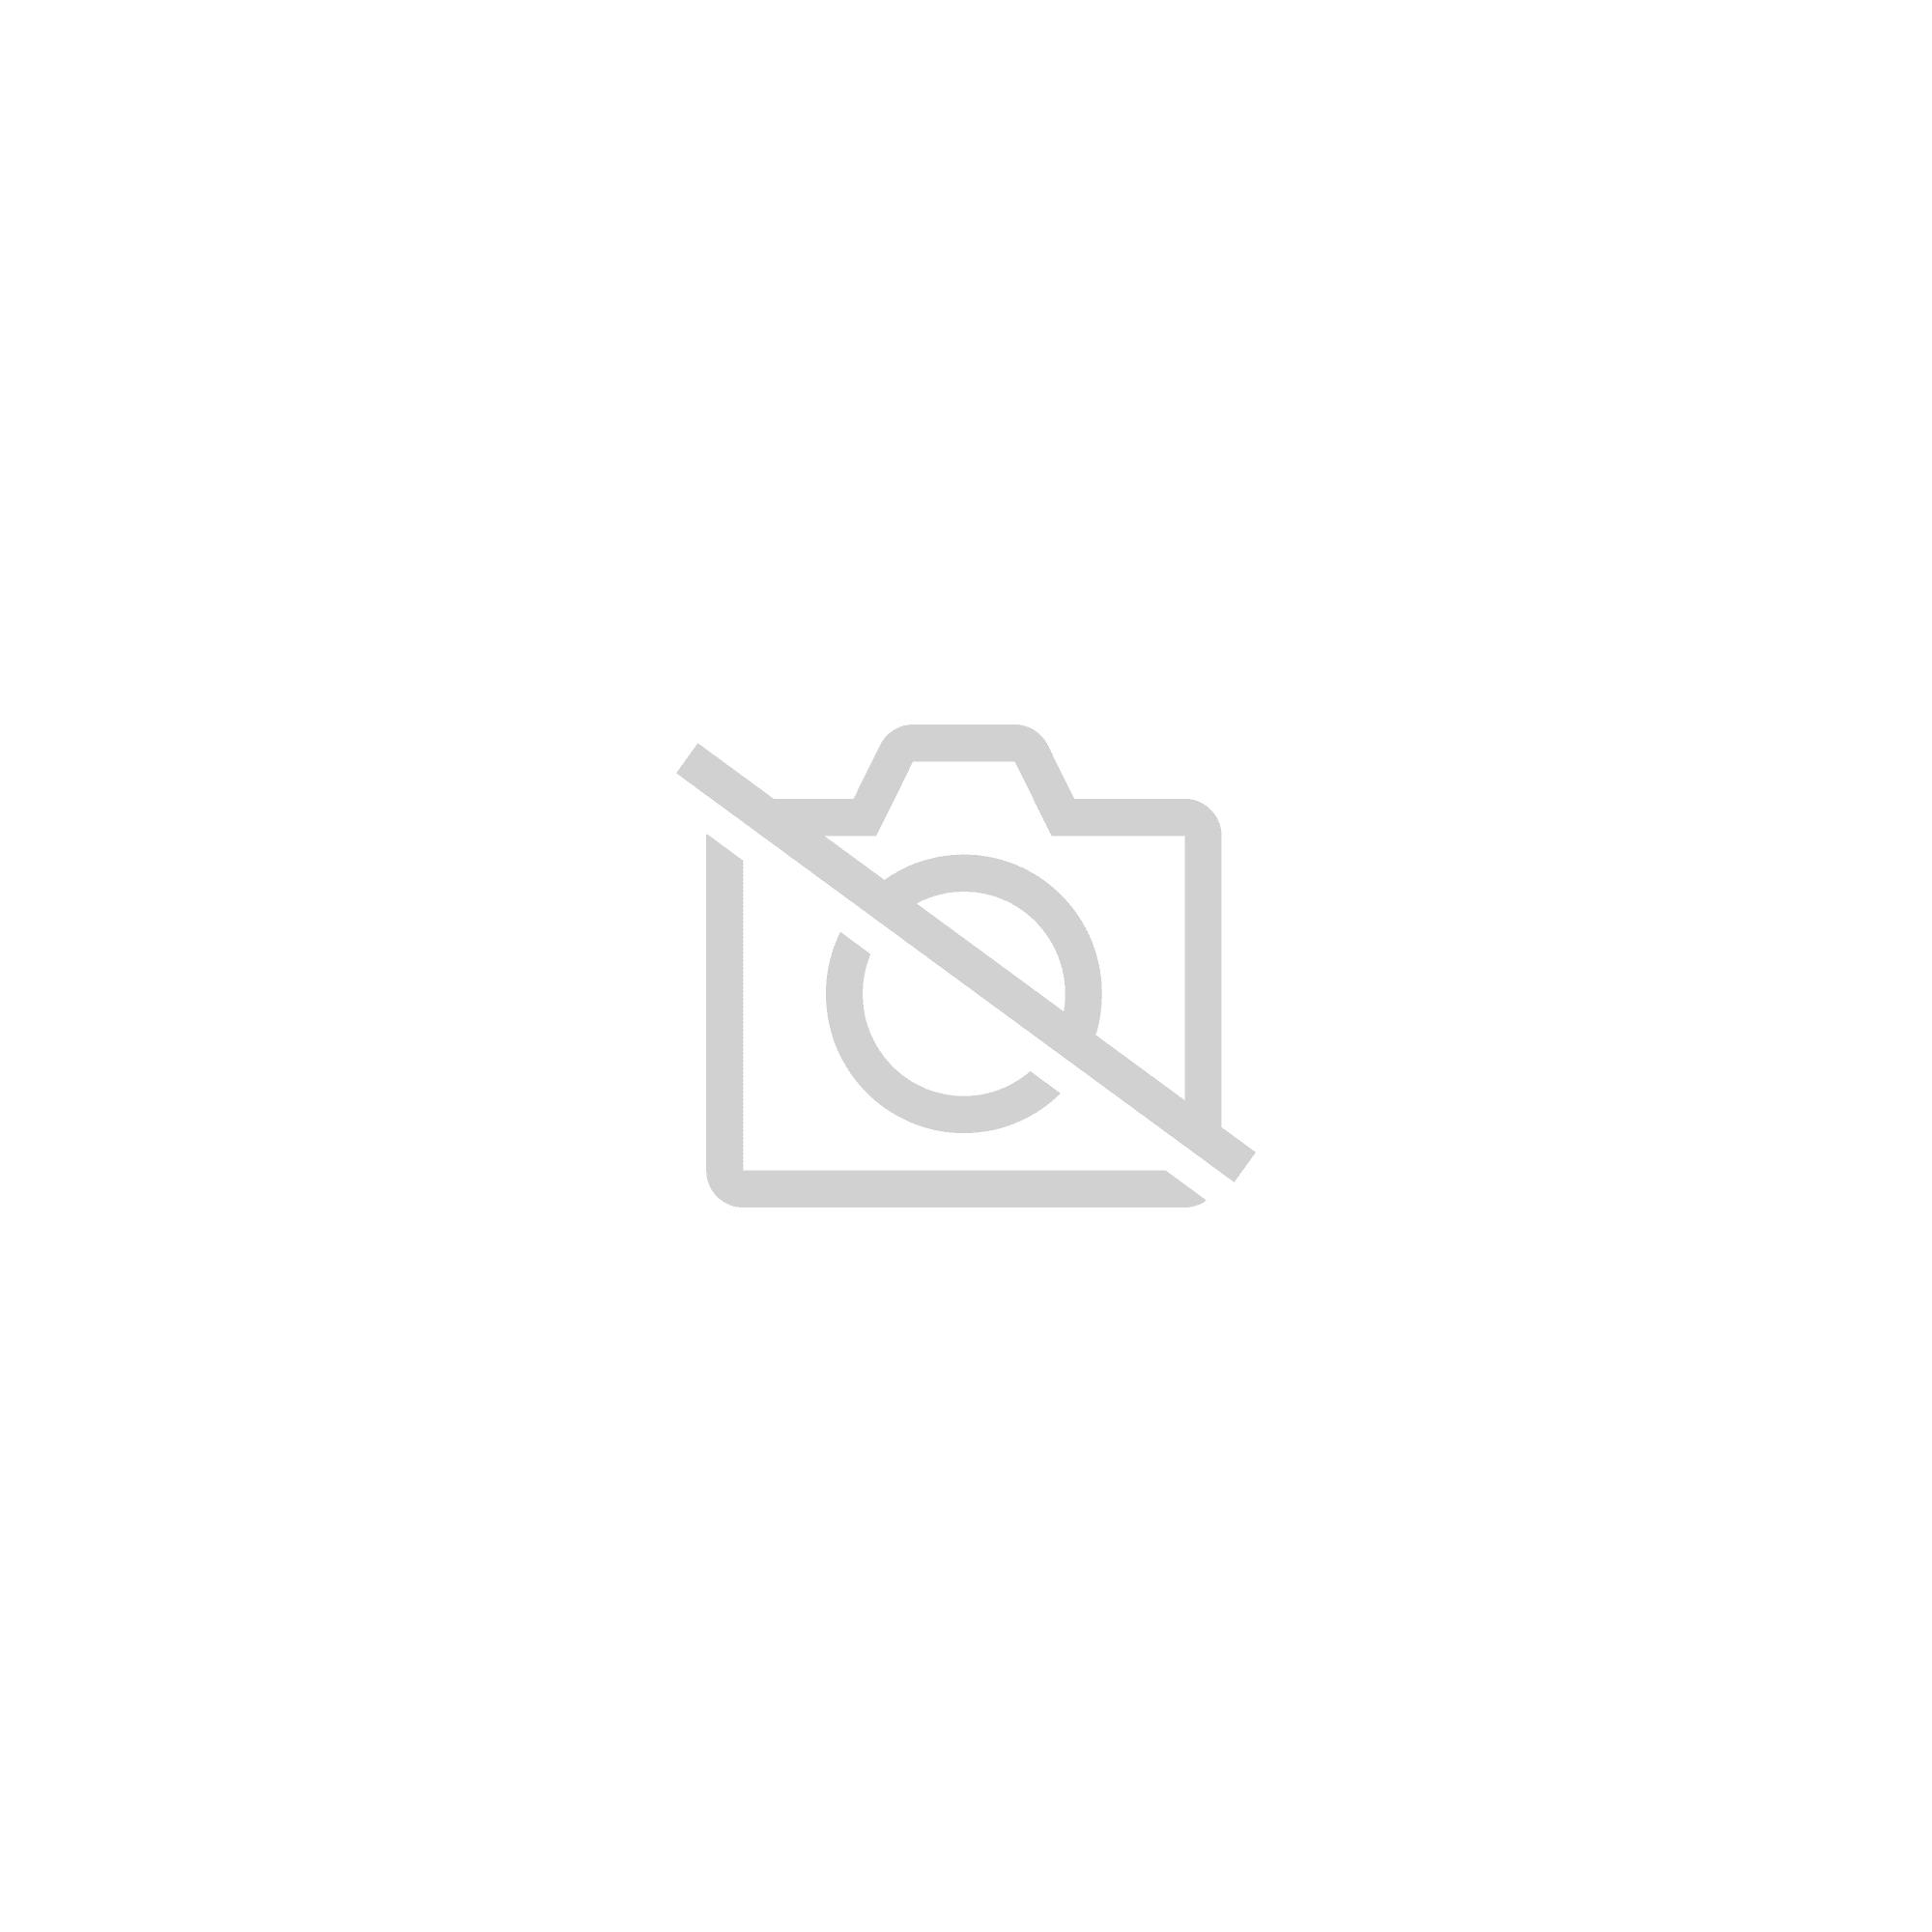 46733cd04814a9 FRANCE DIMANCHE N° 2731 DU 01 01 1999 - DIDIER COLIN - HOROSCOPE